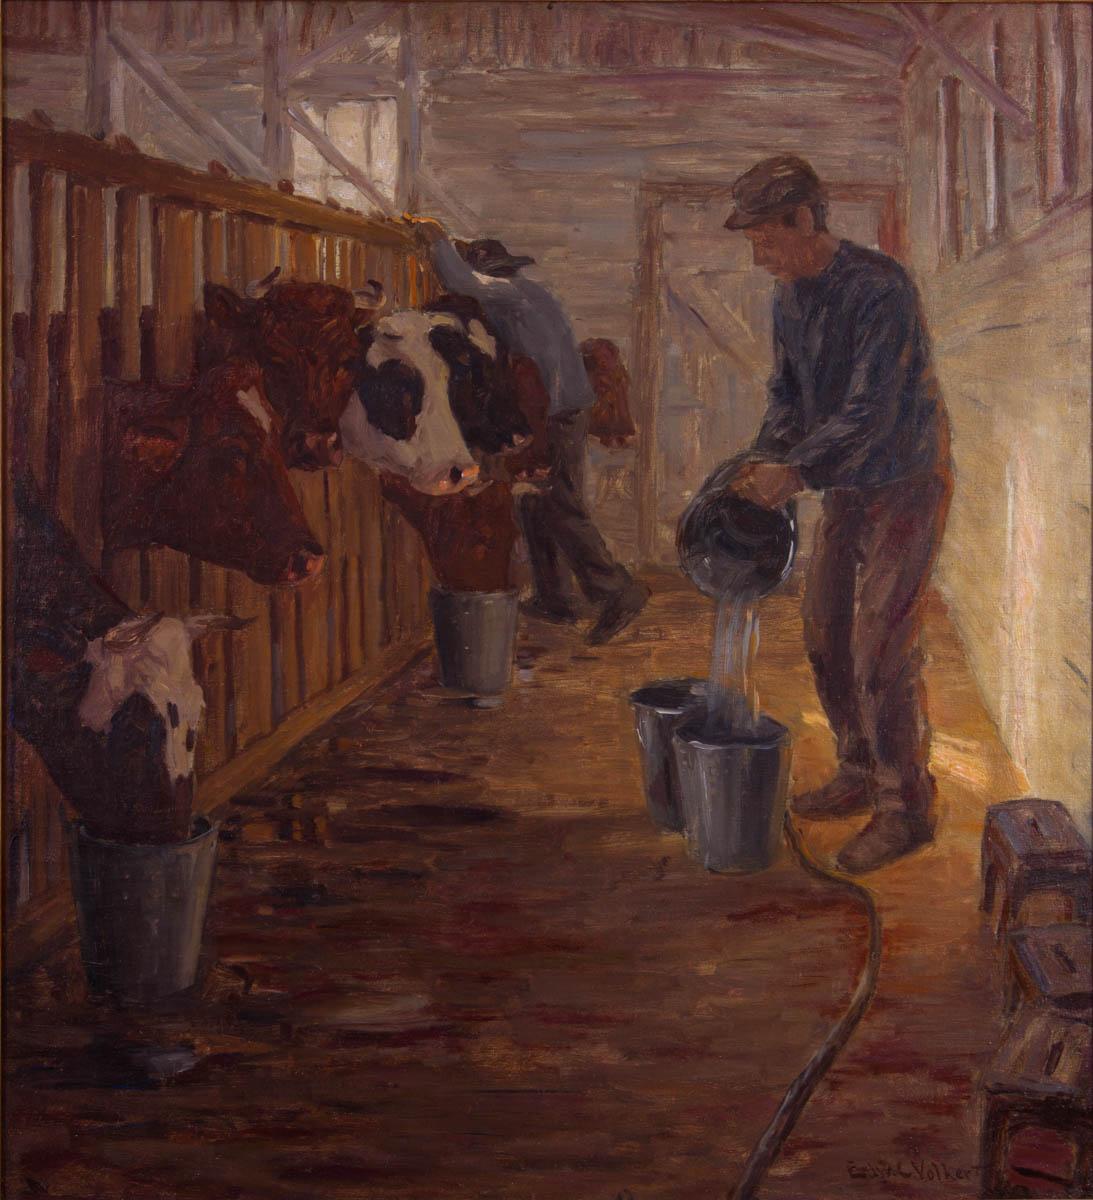 Untitled [Farmer watering cows in a barn]